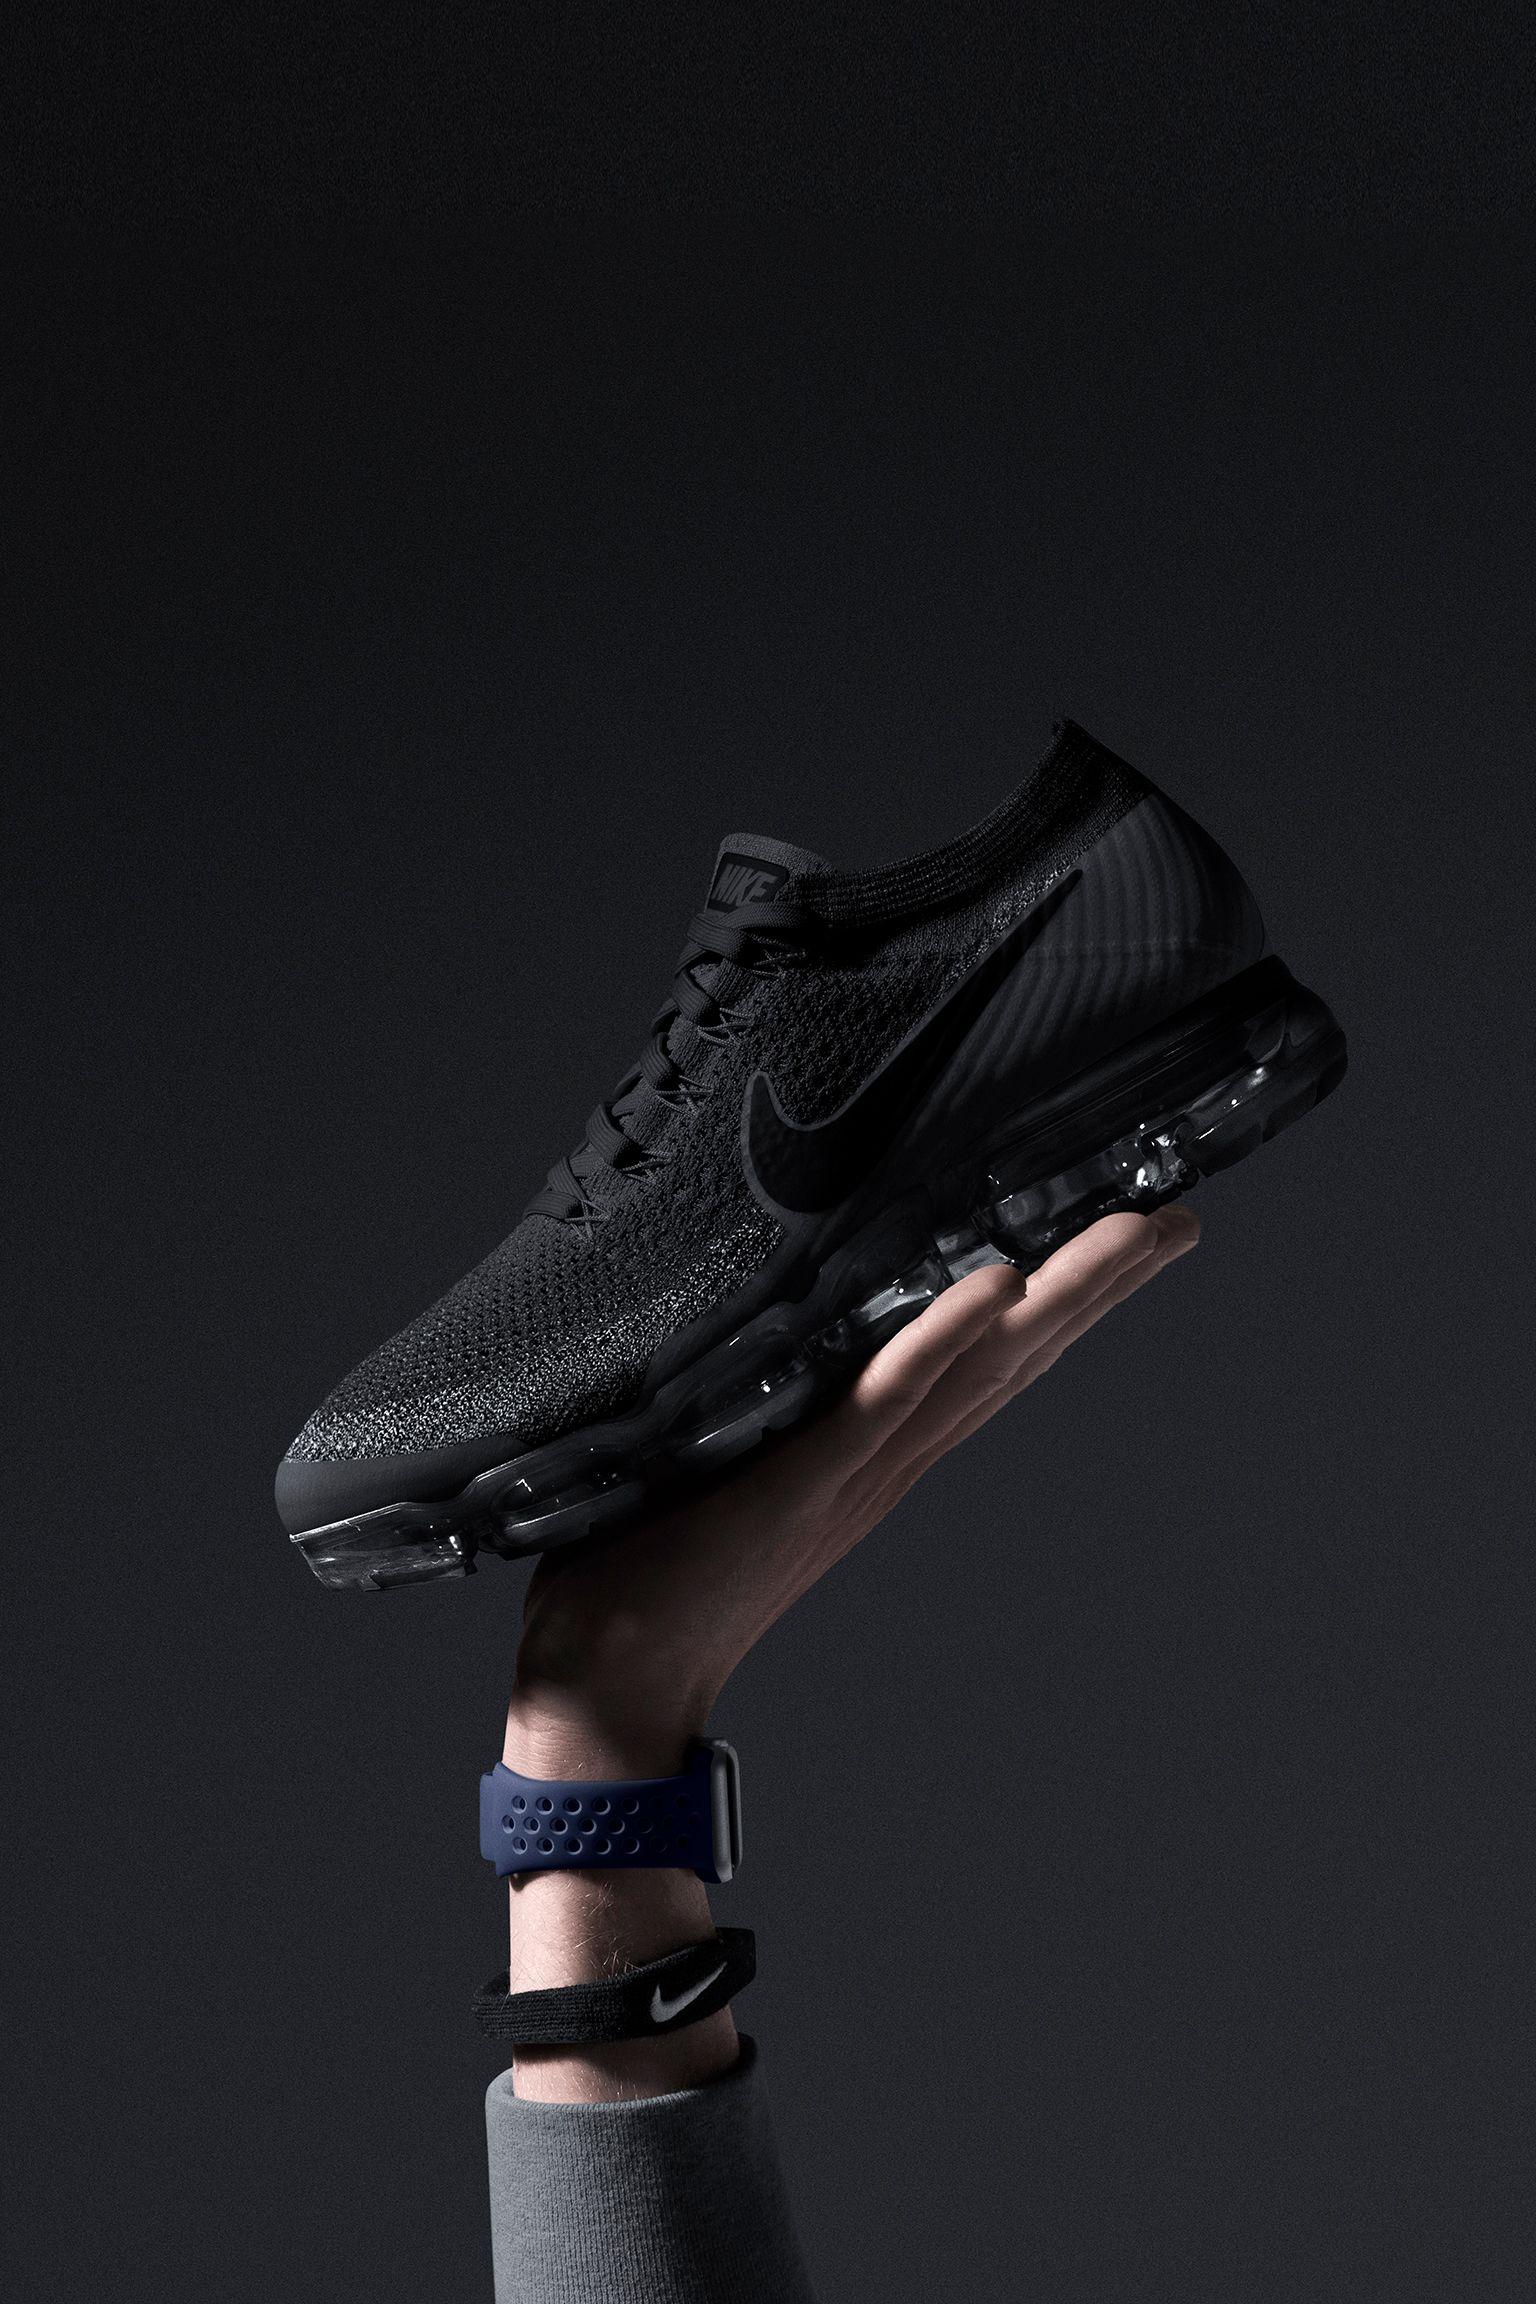 Nike Air VaporMax 'Black/Anthracite'